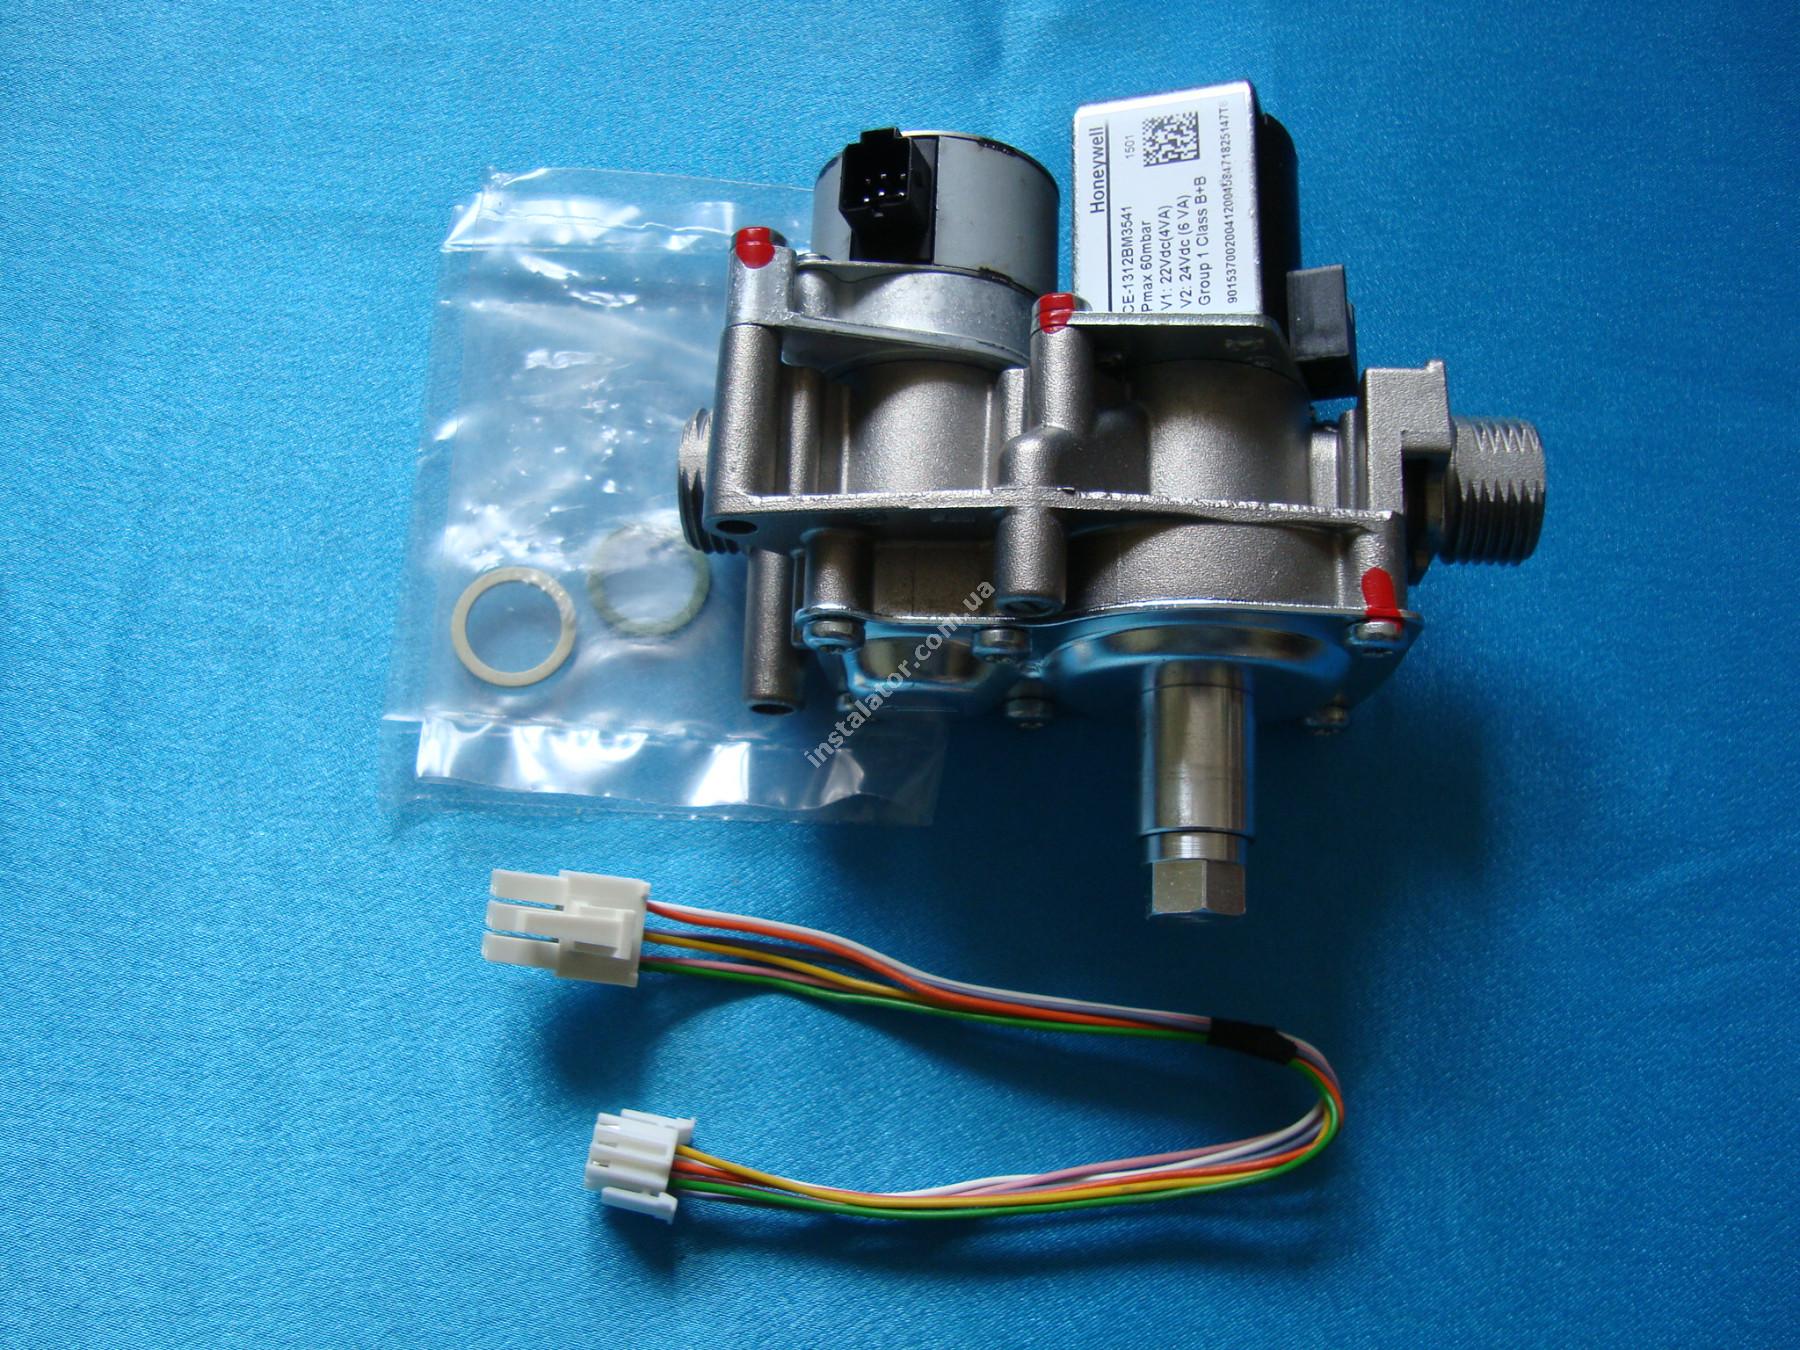 S1071600 Газовий клапан з регулятором SAUNIER DUVAL Themaclassic, Isofast, Combitek  full-image-3